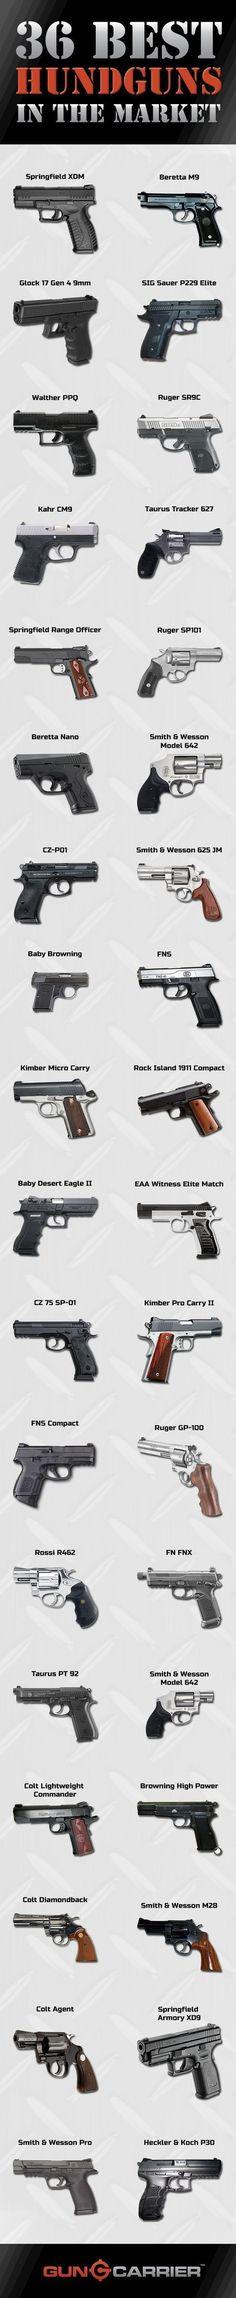 36 Best Handguns in the Market - Waffen - Militar Weapons Guns, Guns And Ammo, Glock Guns, Pistola Airsoft, Best Handguns, By Any Means Necessary, Cool Guns, Awesome Guns, Tactical Gear